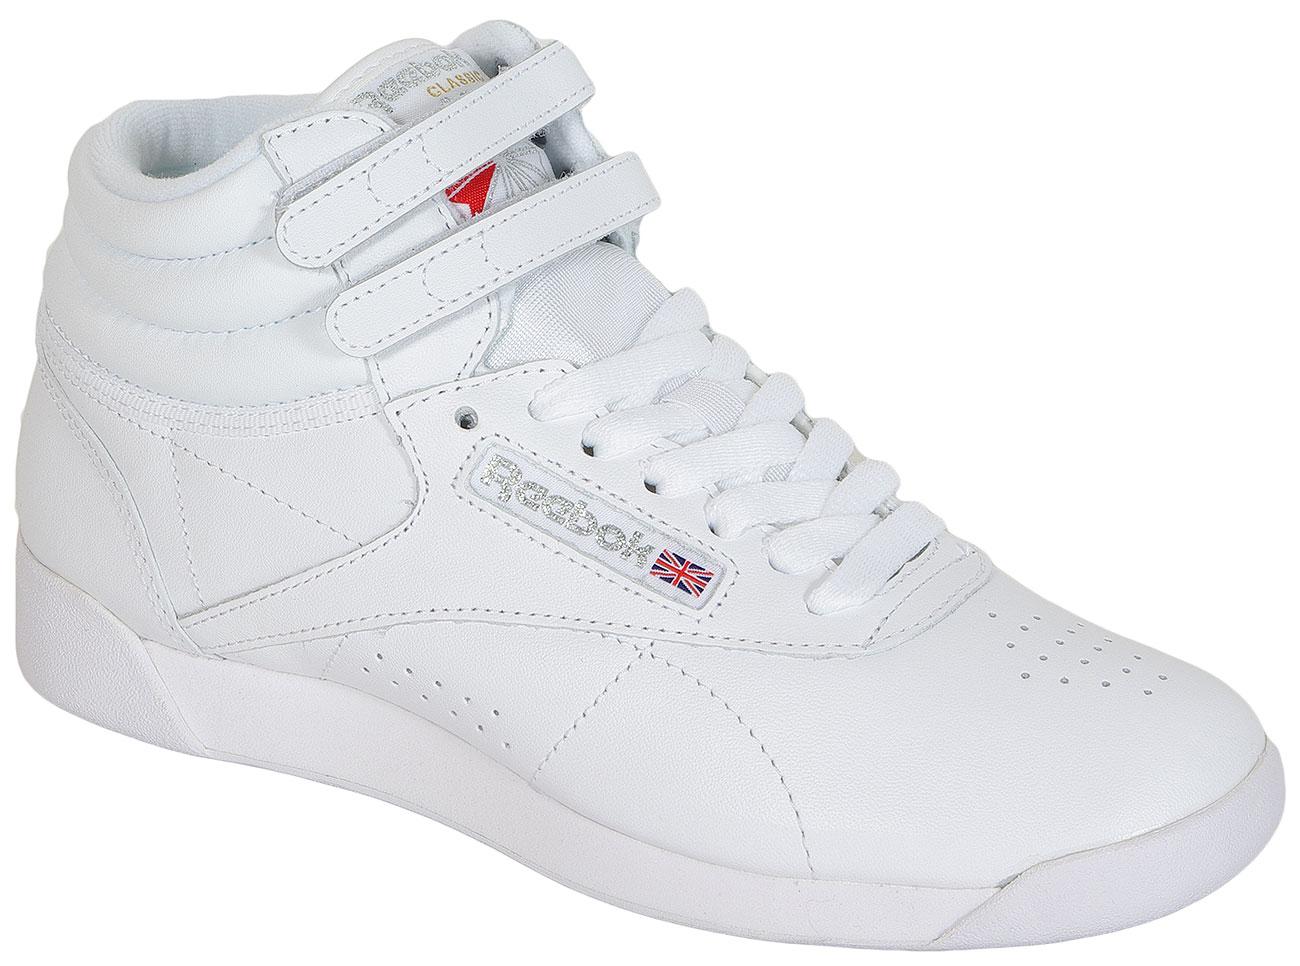 Reebok F/S HI White/Silver sneakers